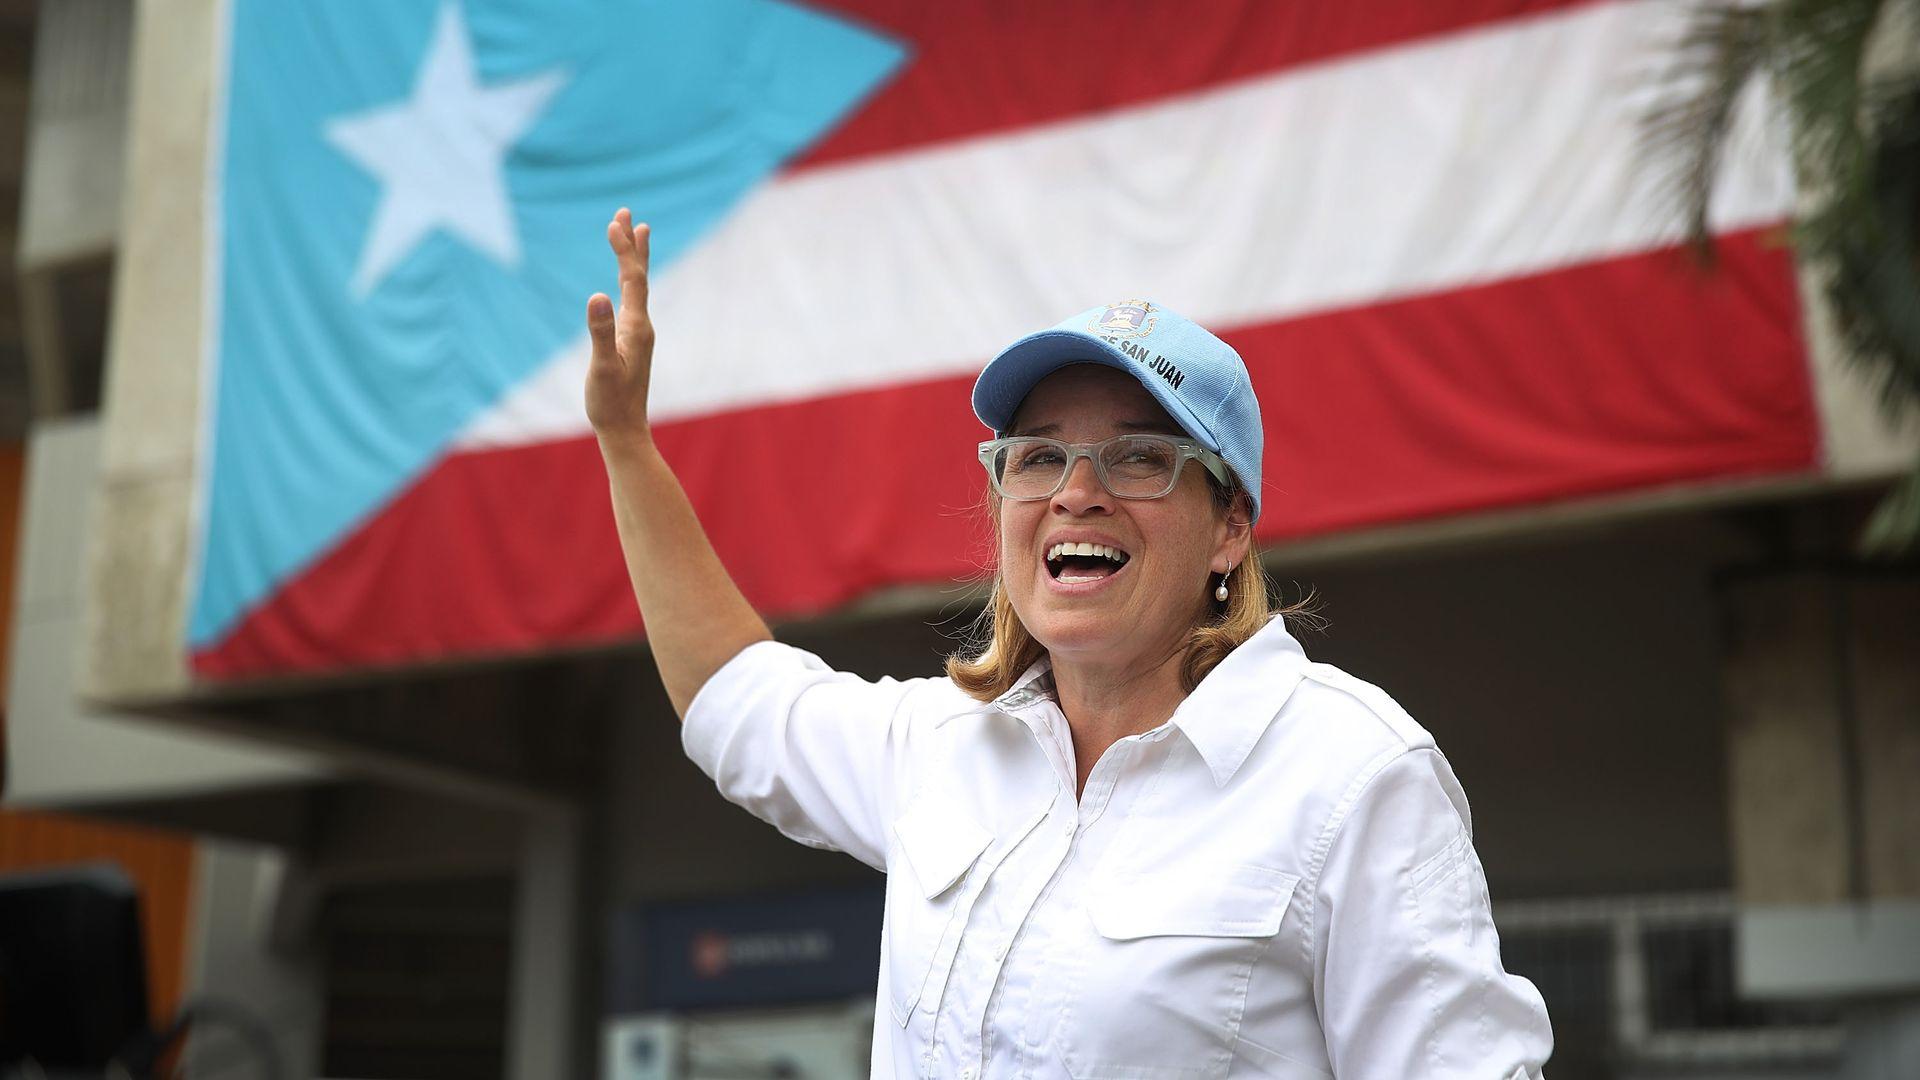 San Juan Mayor Carmen Yulin Cruz during Hurricane Maria recovery in 2017